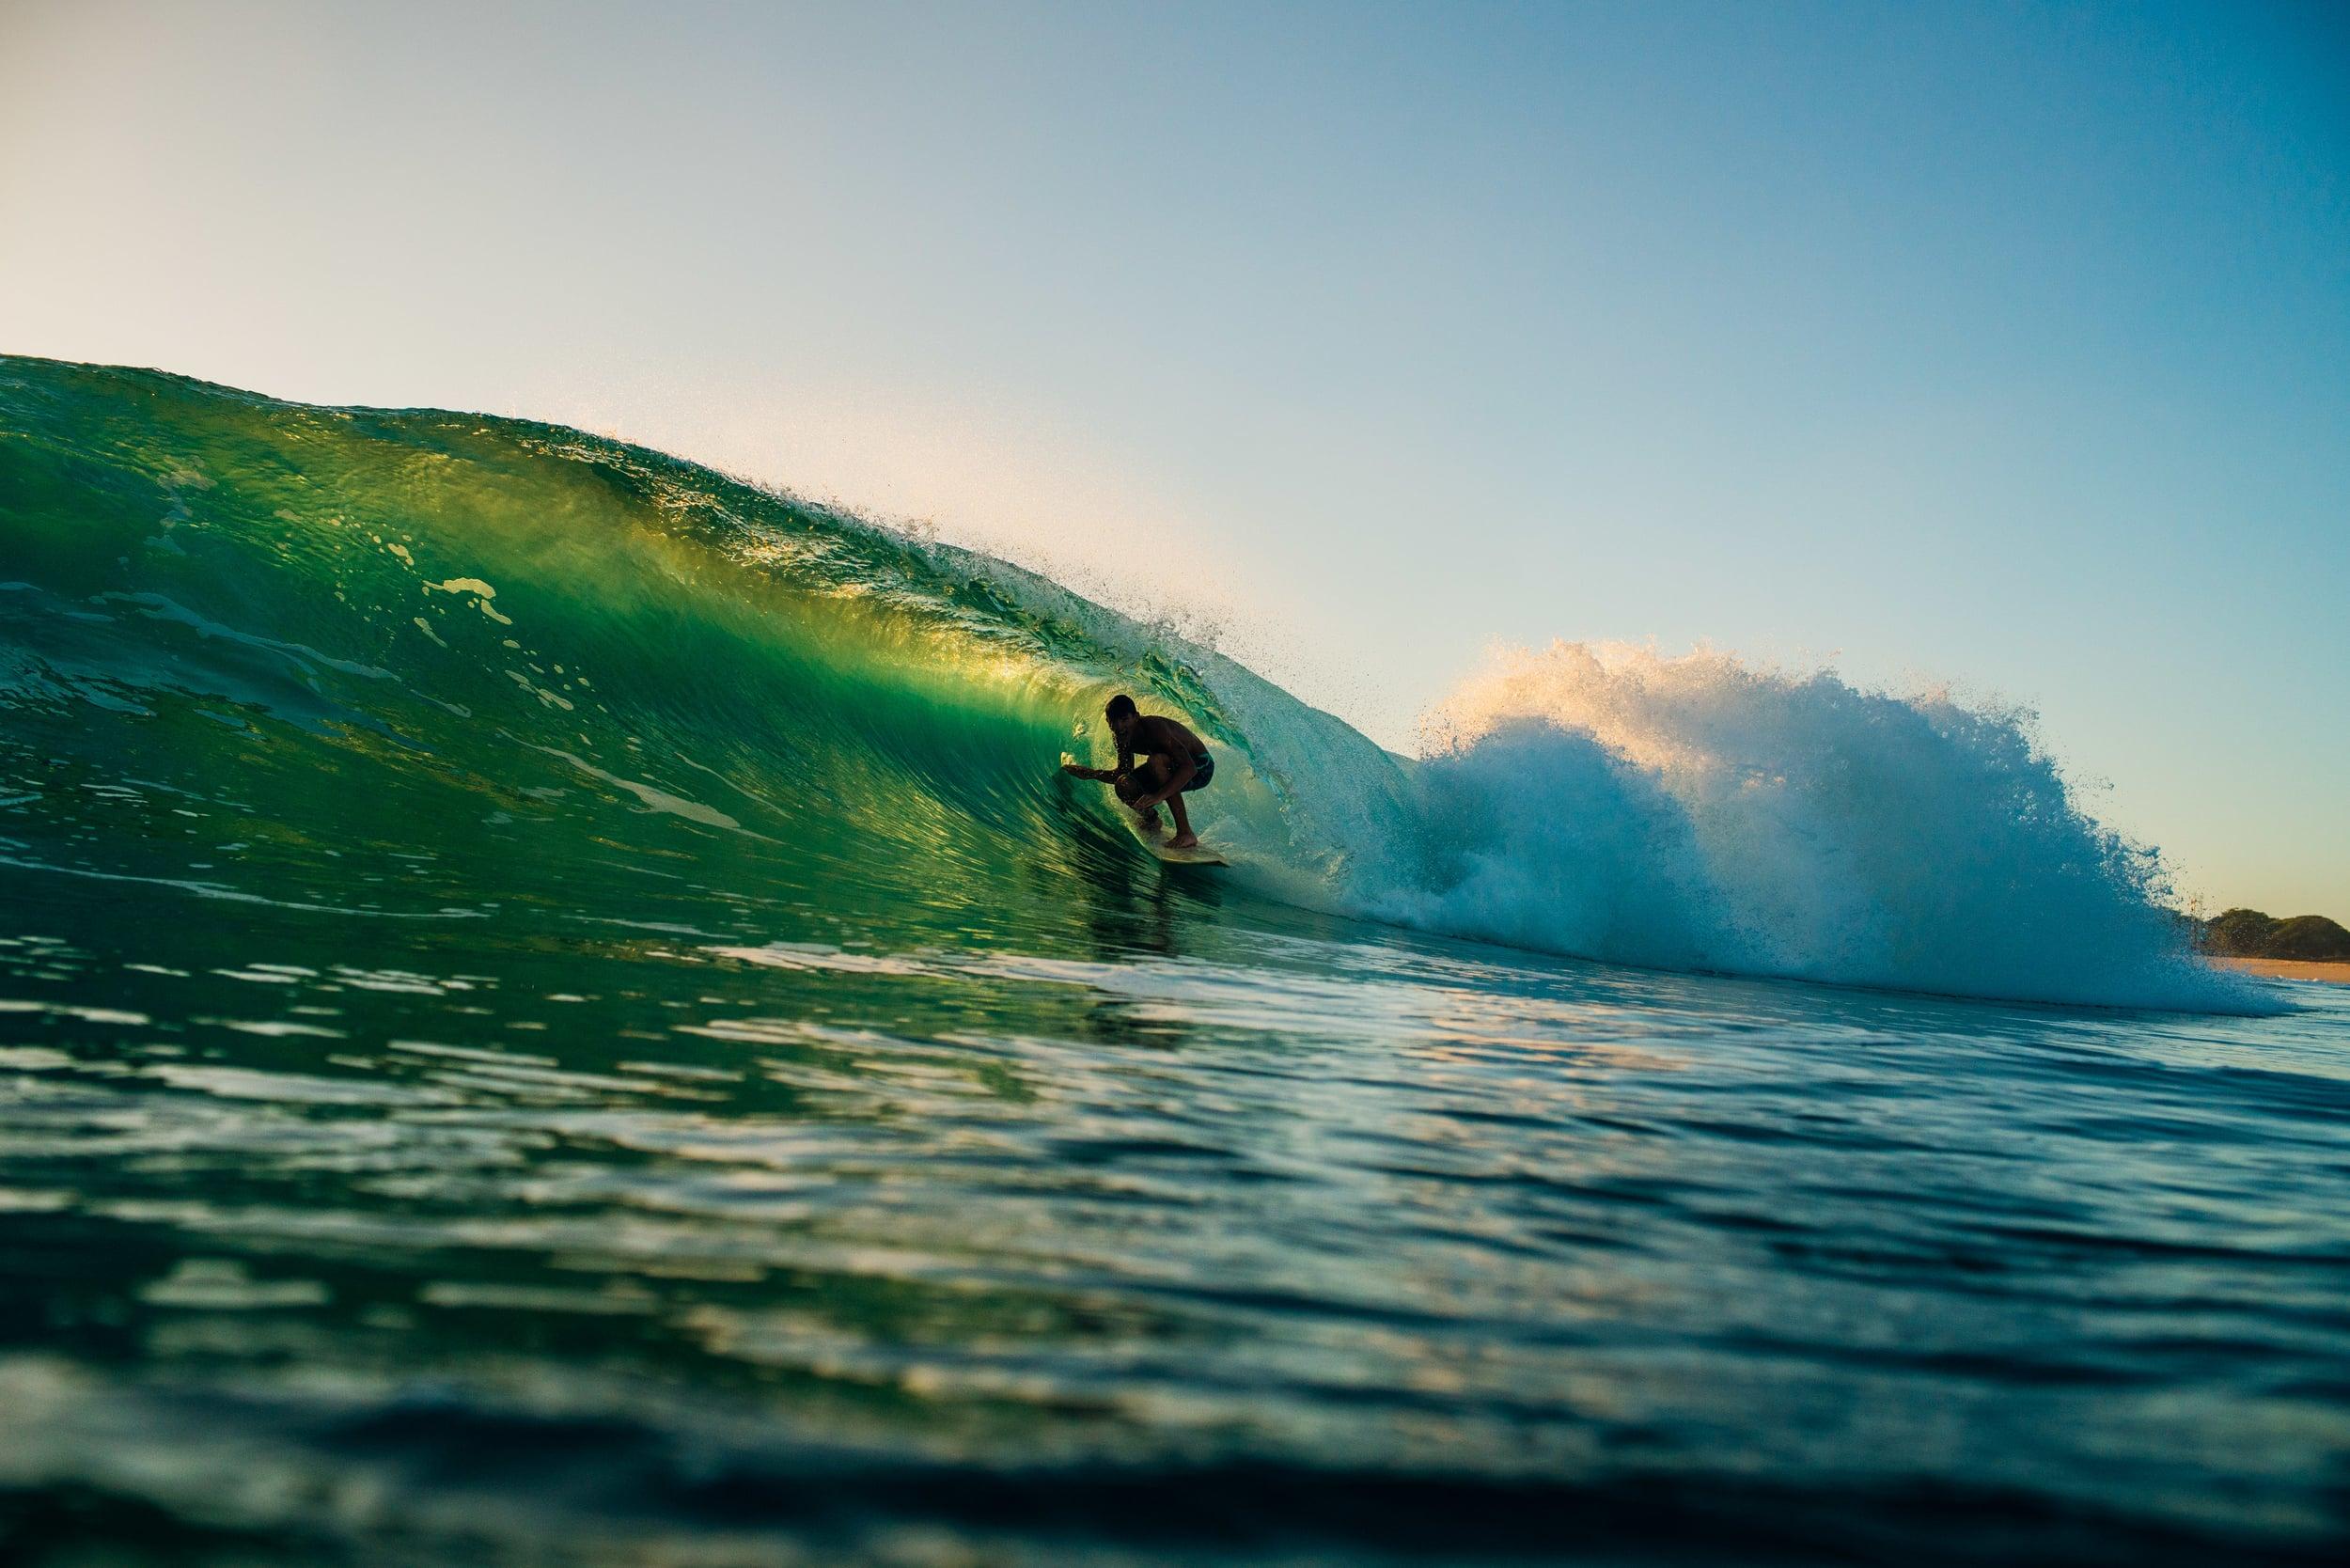 bryce-johnson-photography-kauai-hawaii-surfing-a7rii-aquatech-water-ocean-6.jpg